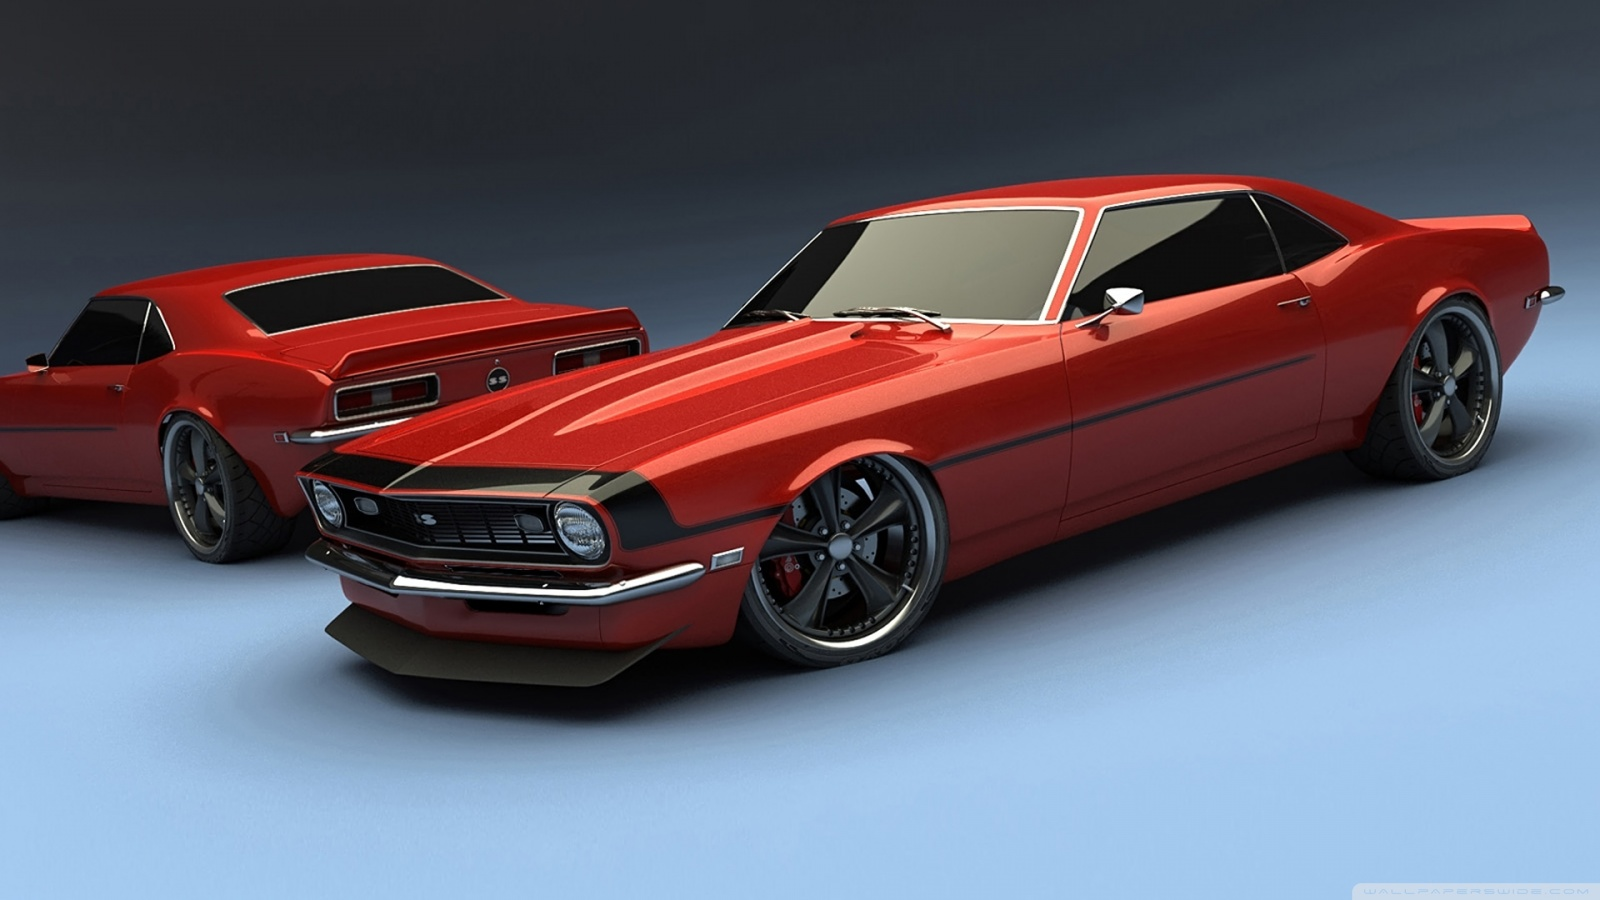 chevy camaro classic cars wallpaper 1600x900jpg 1600x900